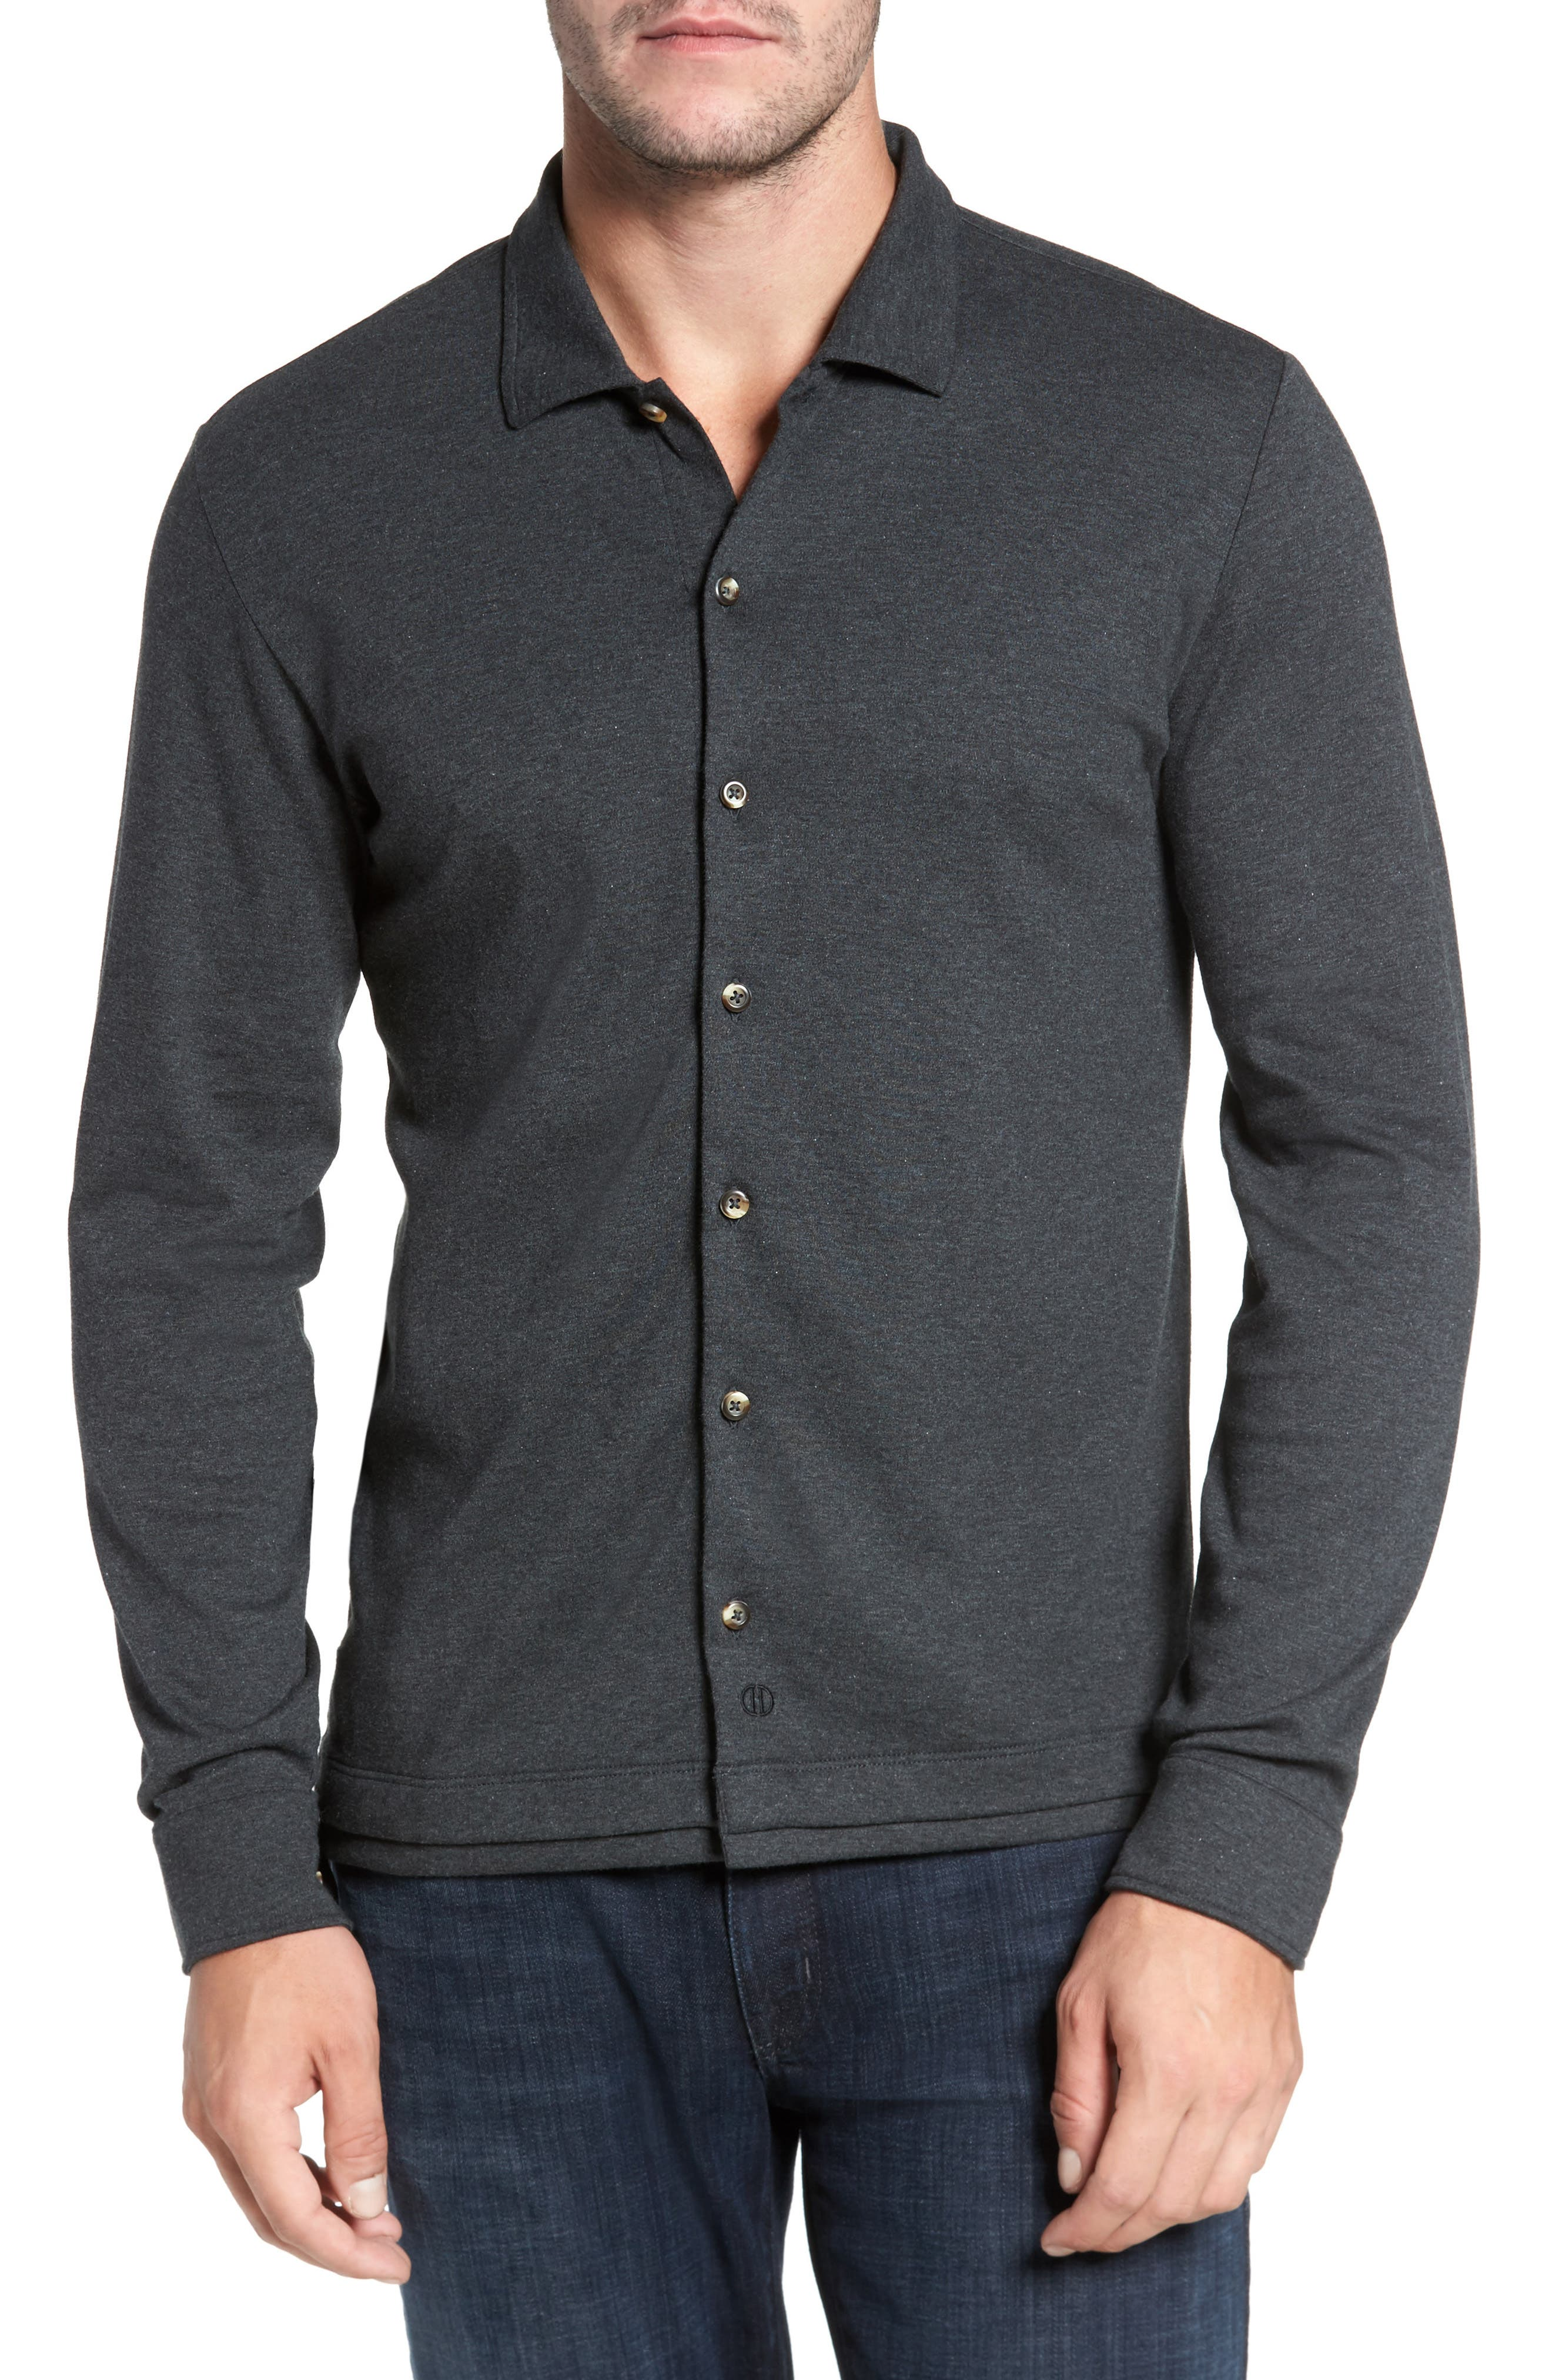 Alternate Image 1 Selected - David Donahue Interlock Knit Sport Shirt